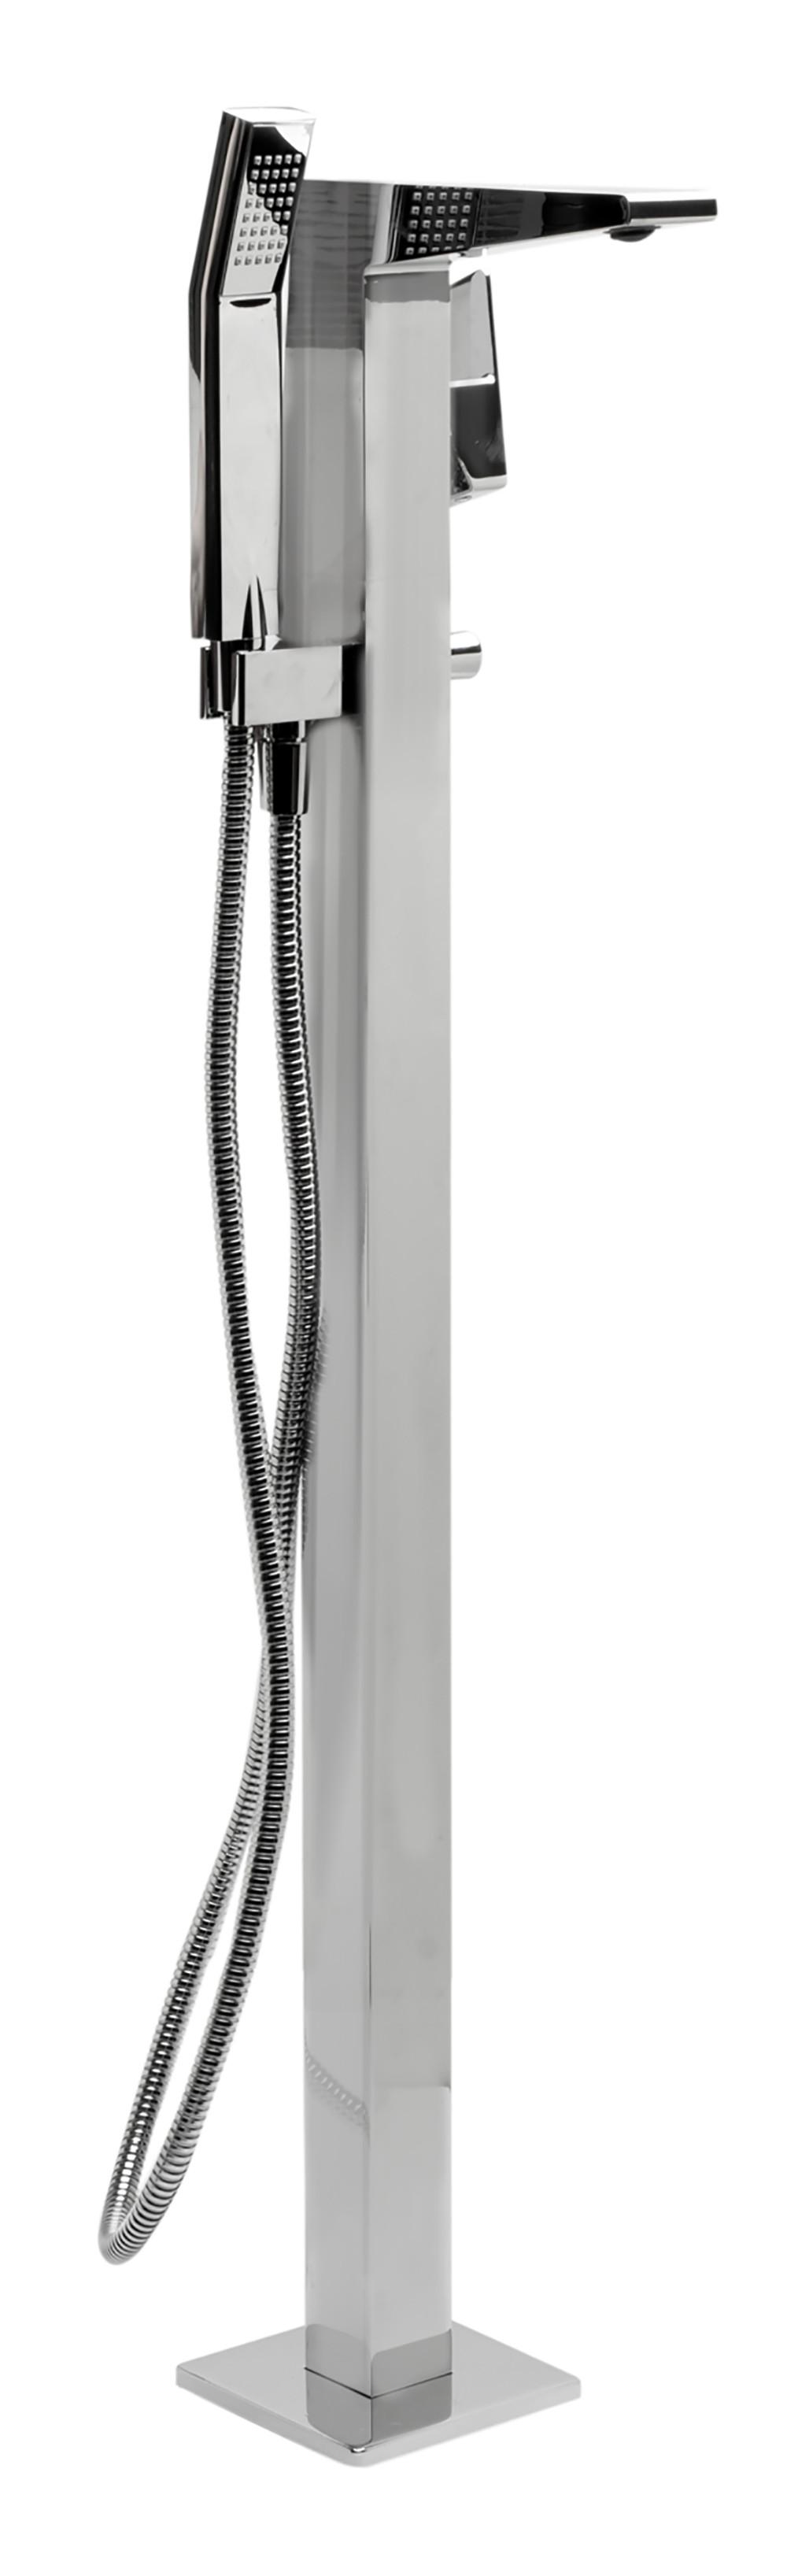 ALFI brand AB2475-PC Polished Chrome Finish